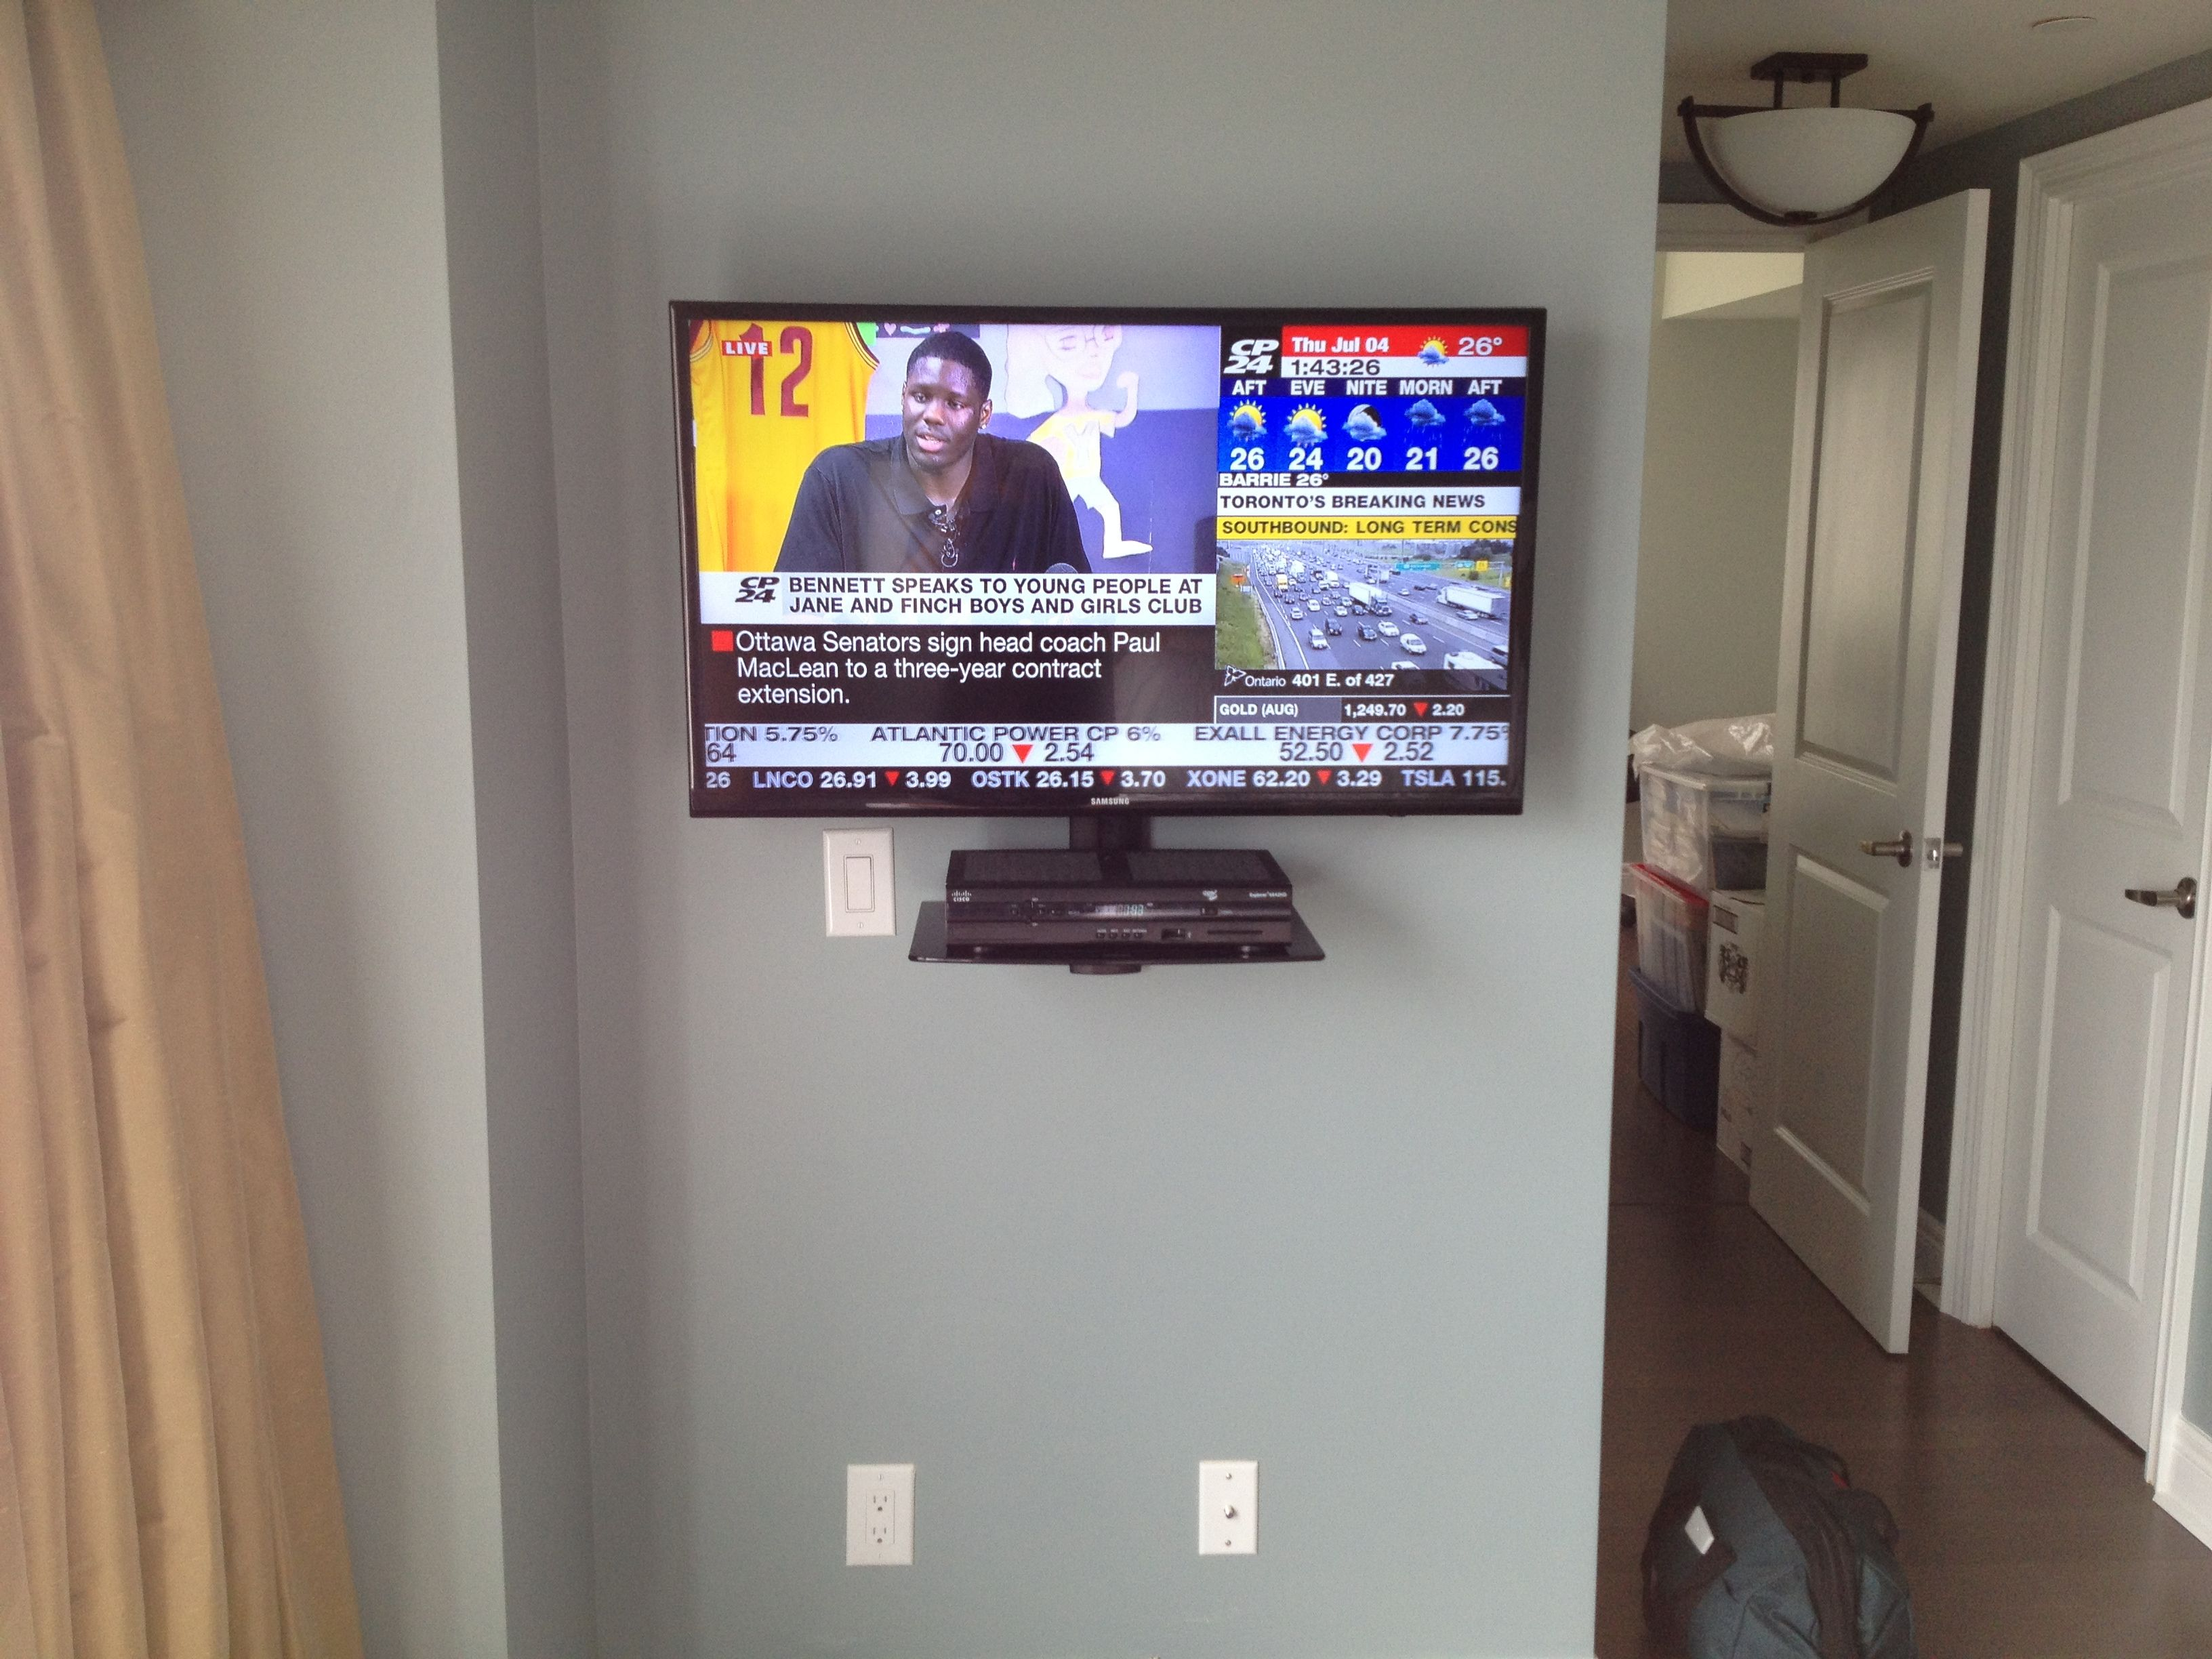 Component Wall Shelf Vs Regular Wall Shelf Wall Shelves Tv Wall